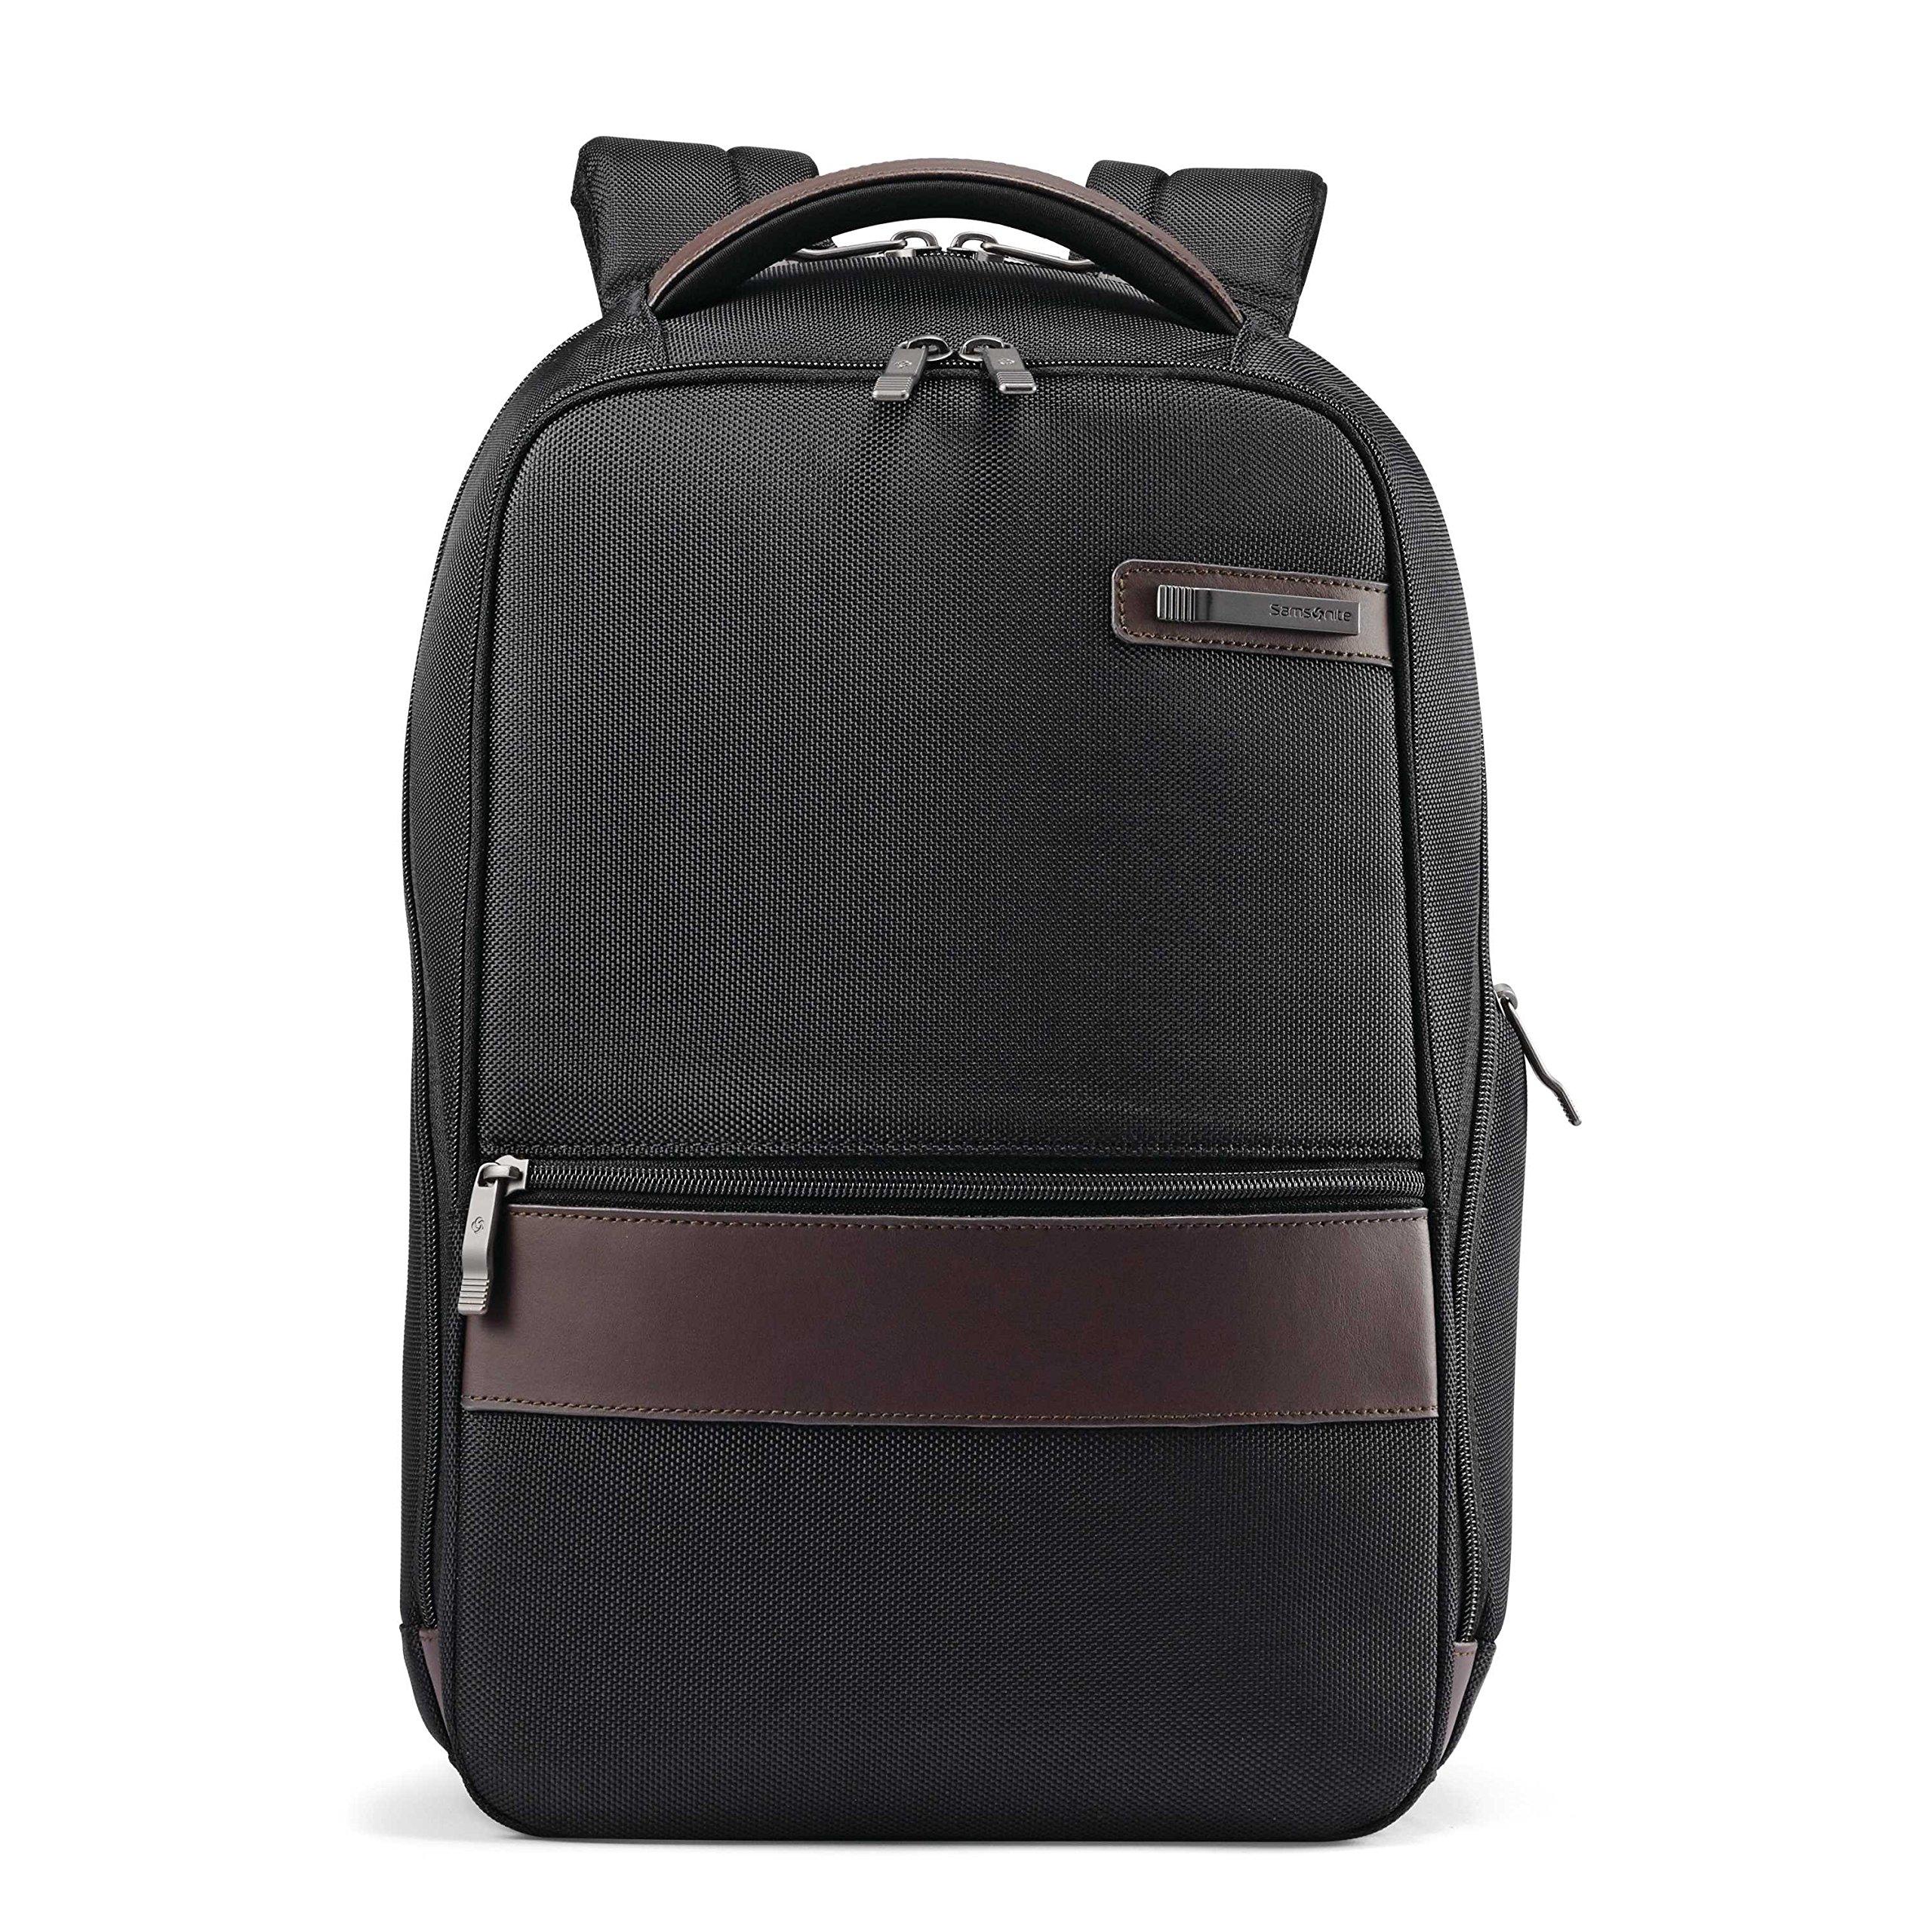 Samsonite Komni Small Backpack, Black/Brown, One Size by Samsonite (Image #2)